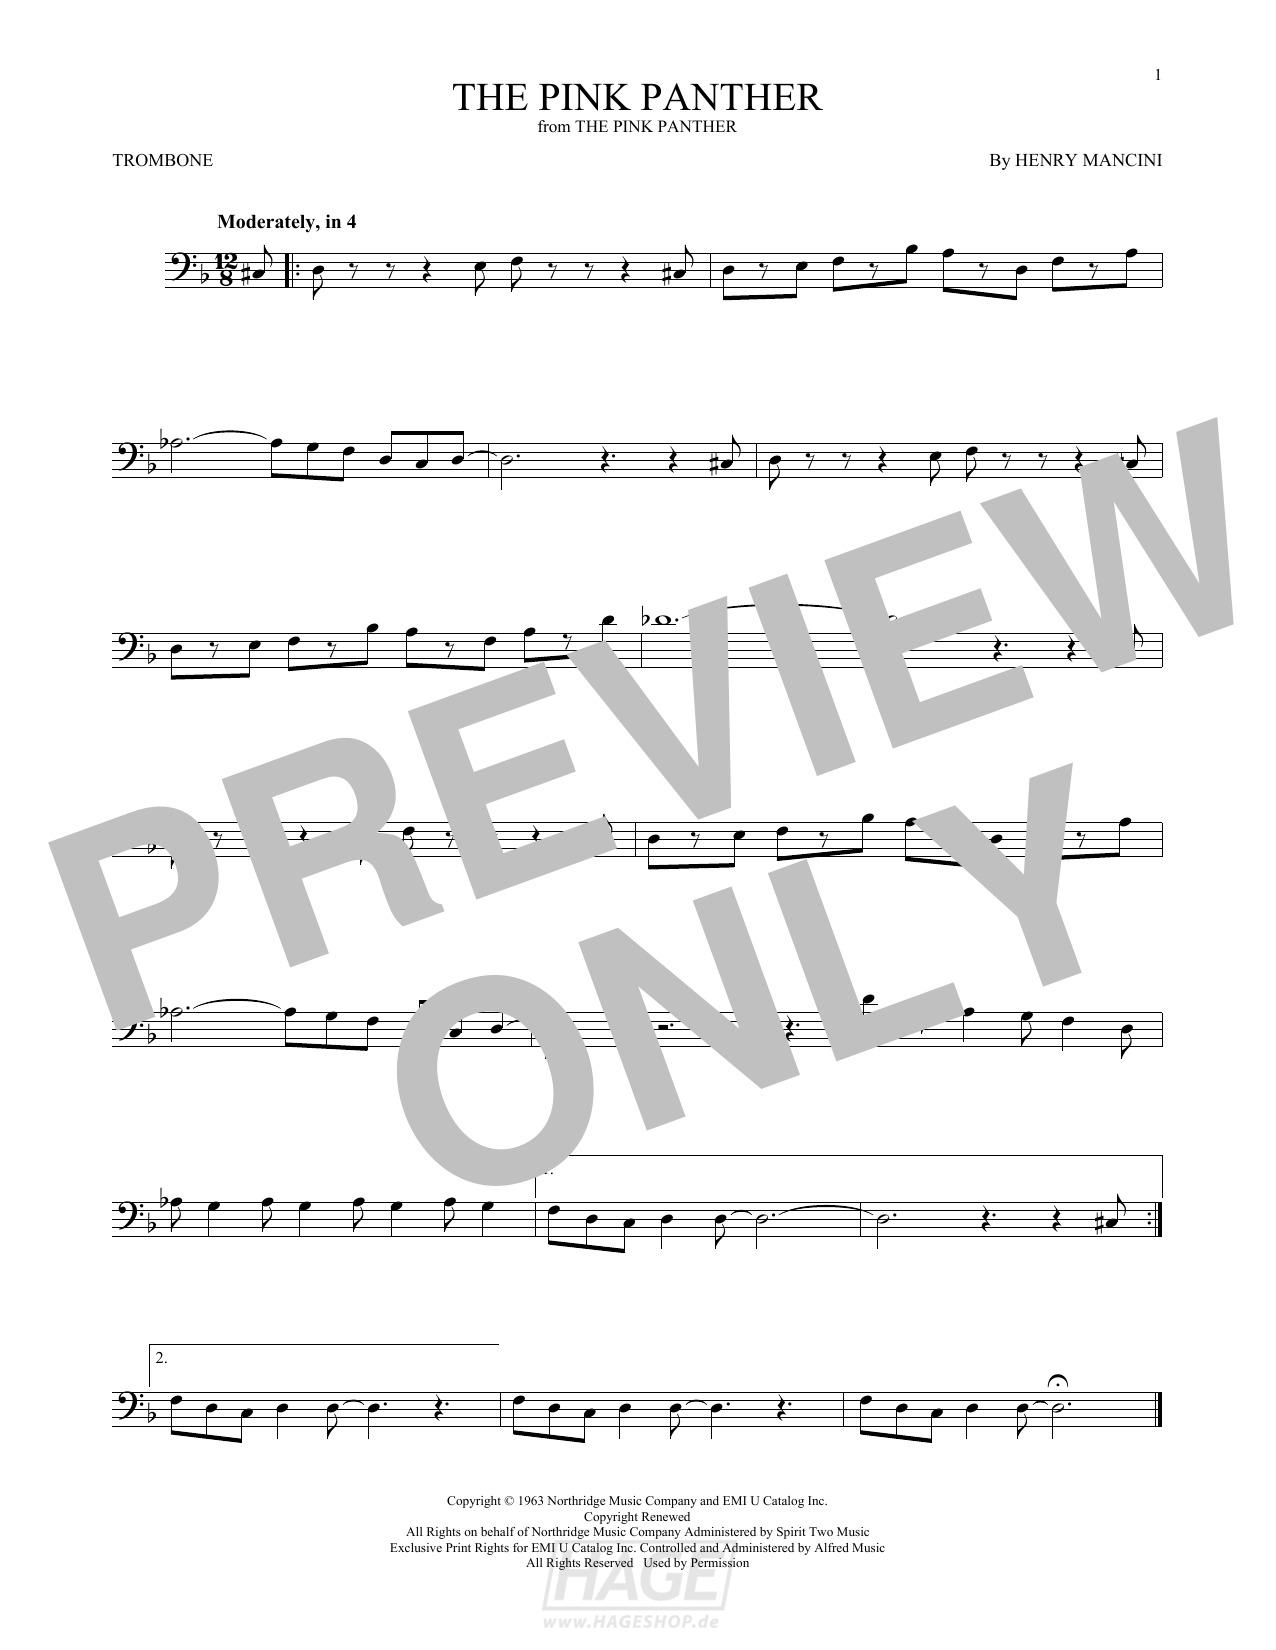 The Pink Panther - Henry Mancini - Noten Druckvorschau